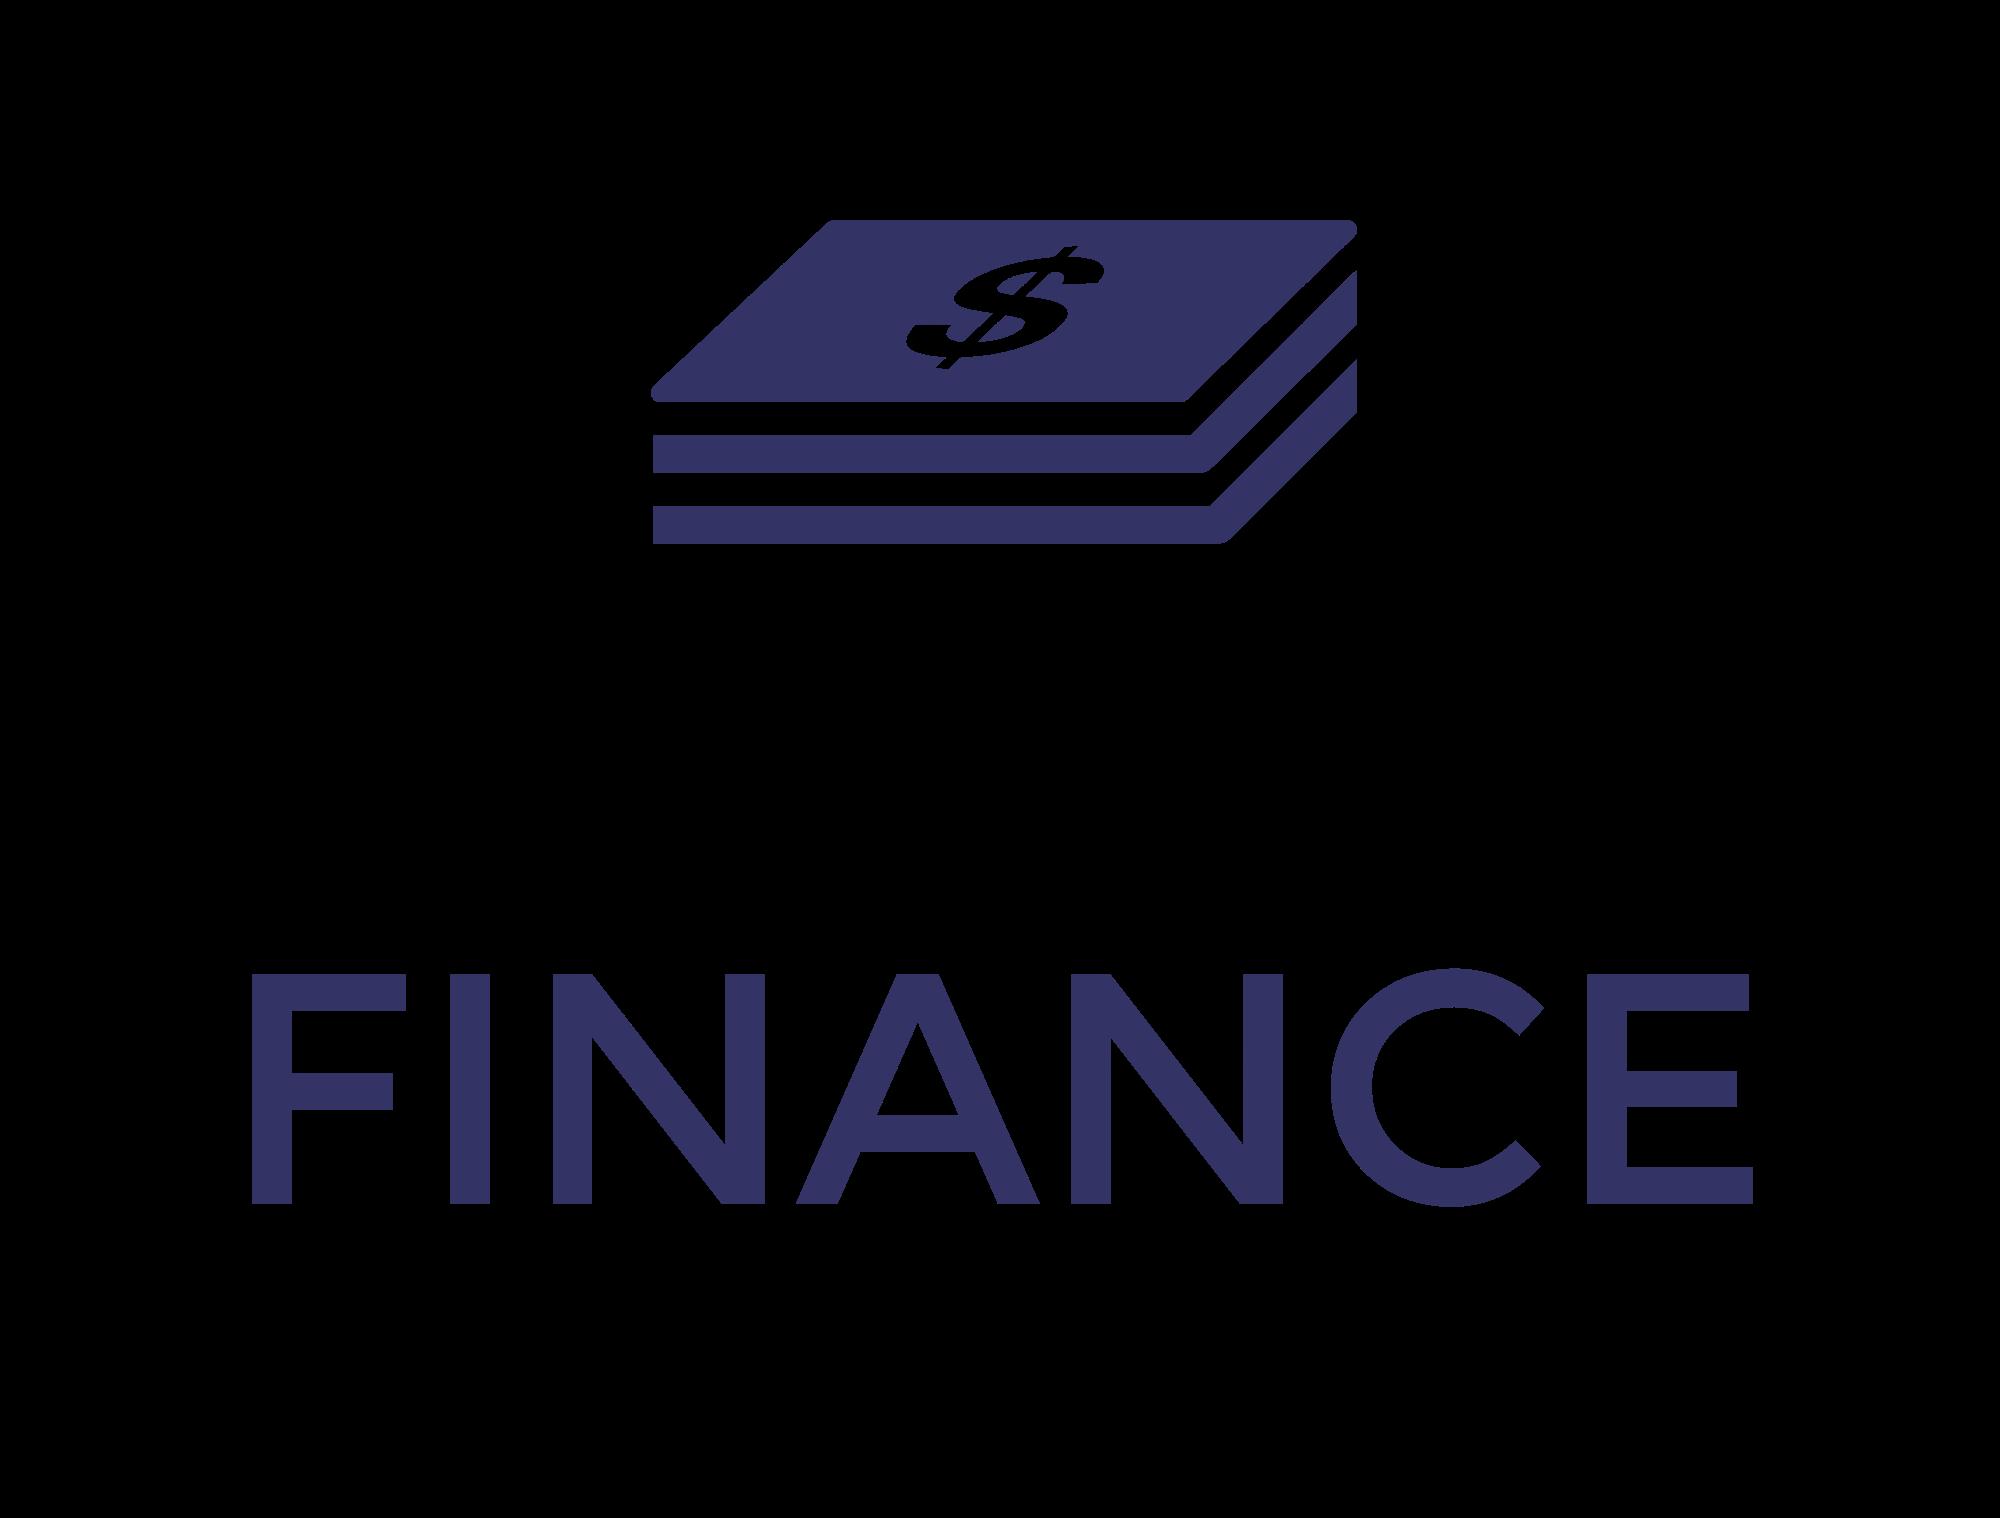 FINANCE-logo.png